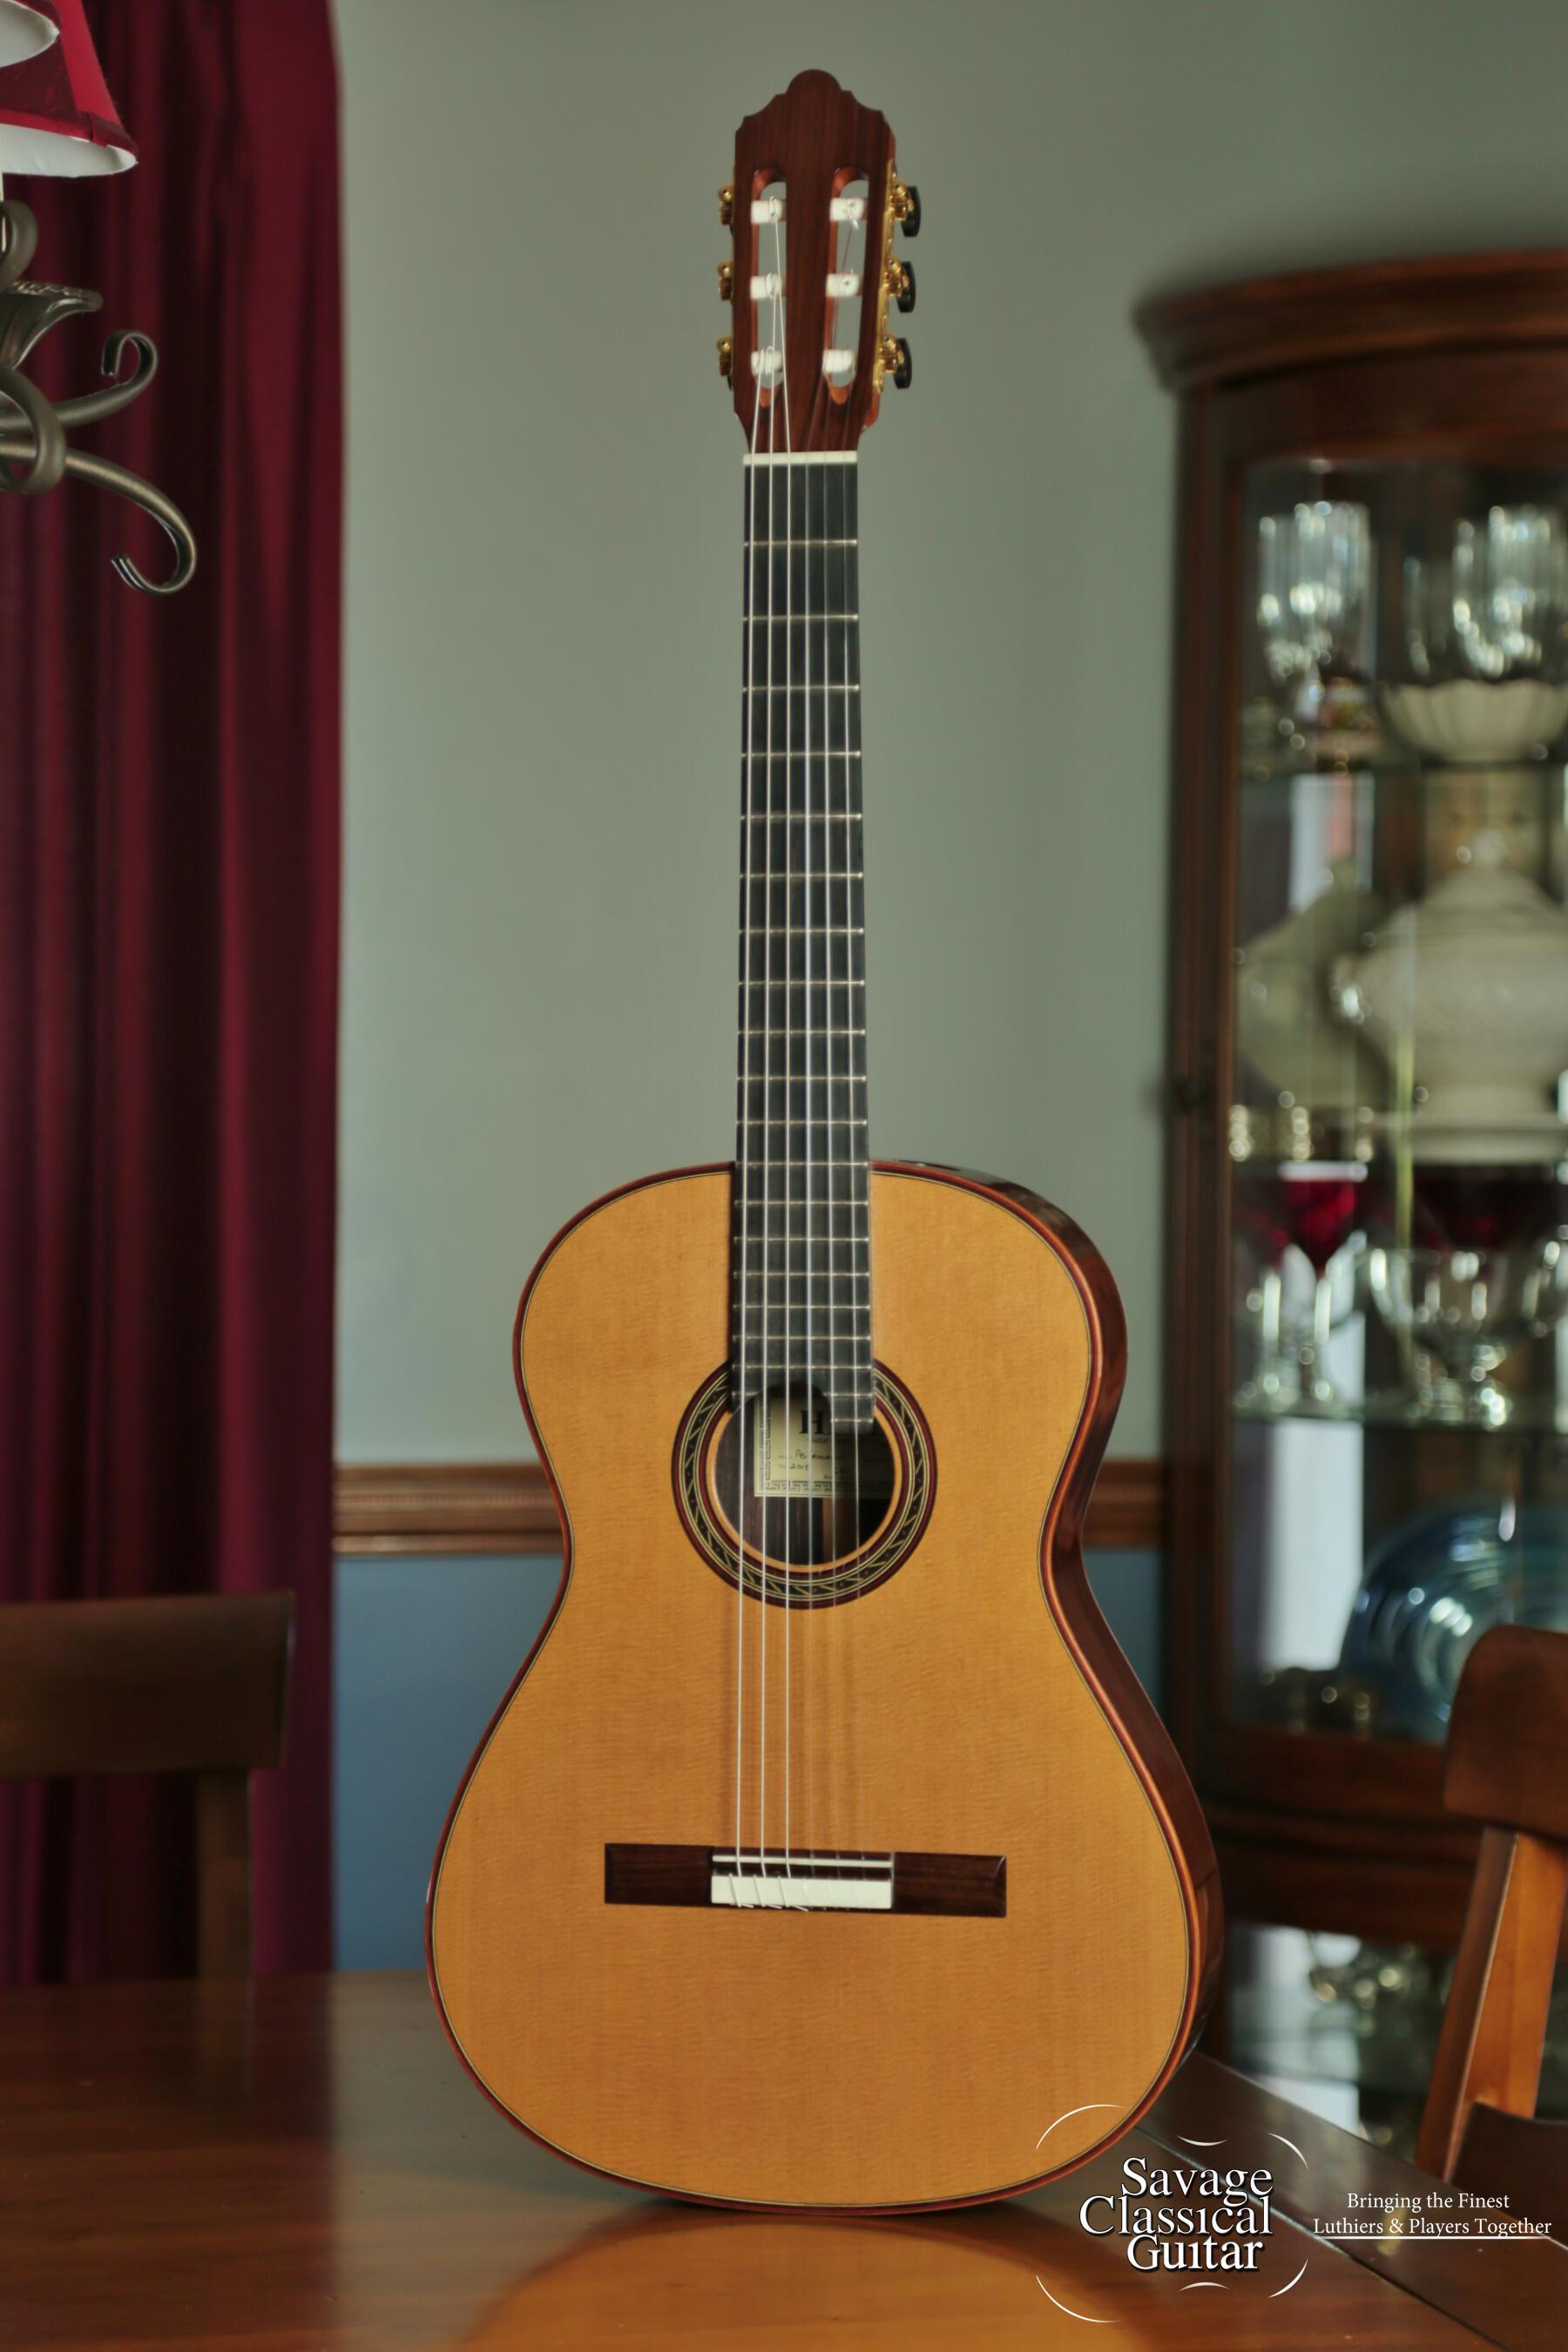 Kenny Hill Performance Classical Guitar #3897 Cedar Double Top with Lattice Bracing